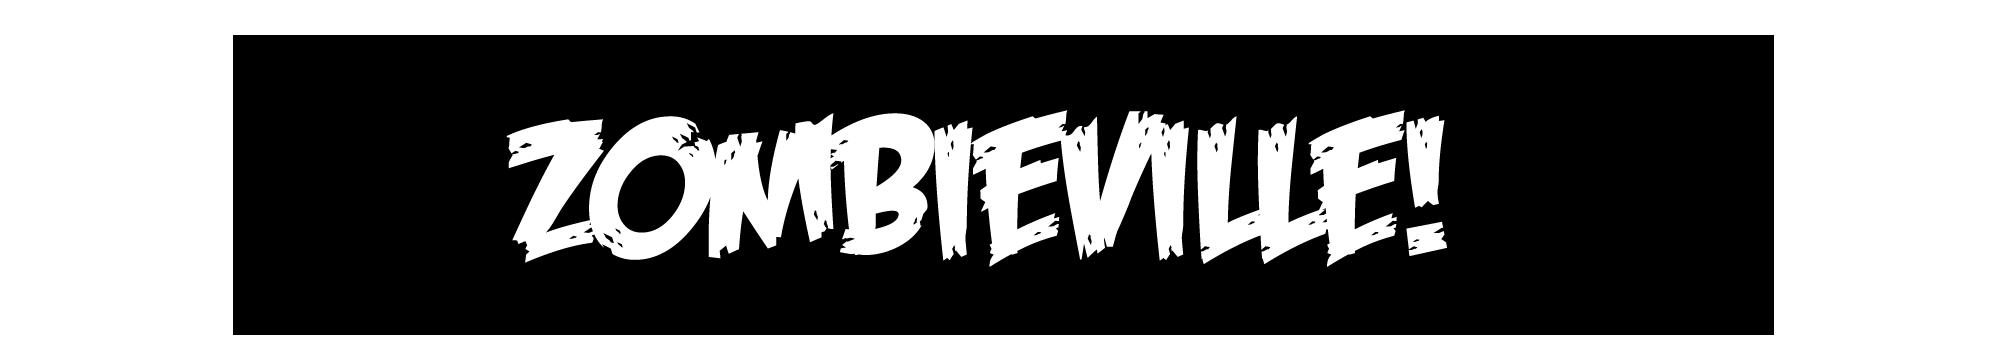 zombieville.png